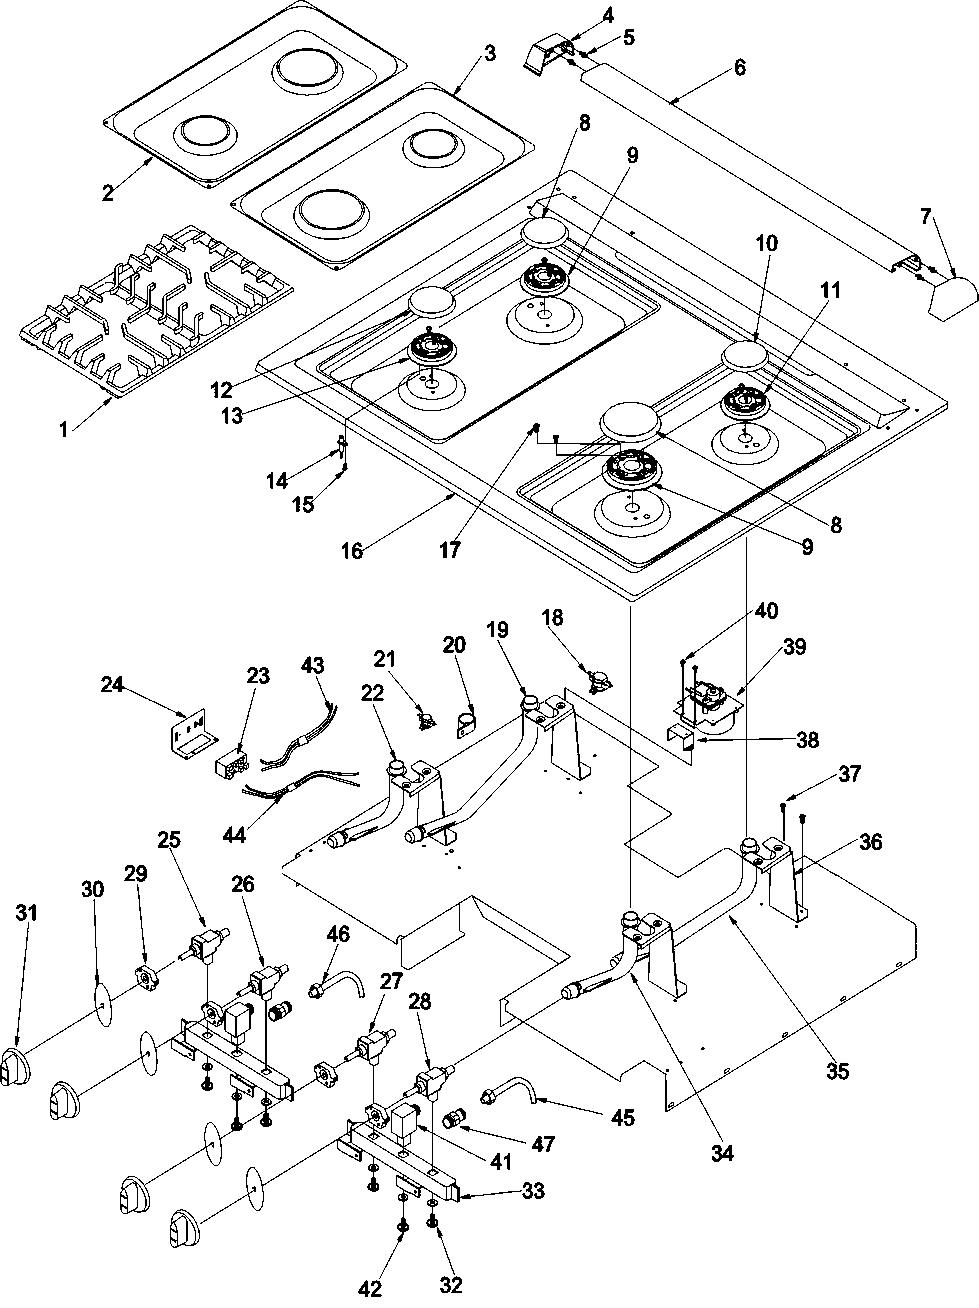 medium resolution of args7650ll gas range main top parts diagram